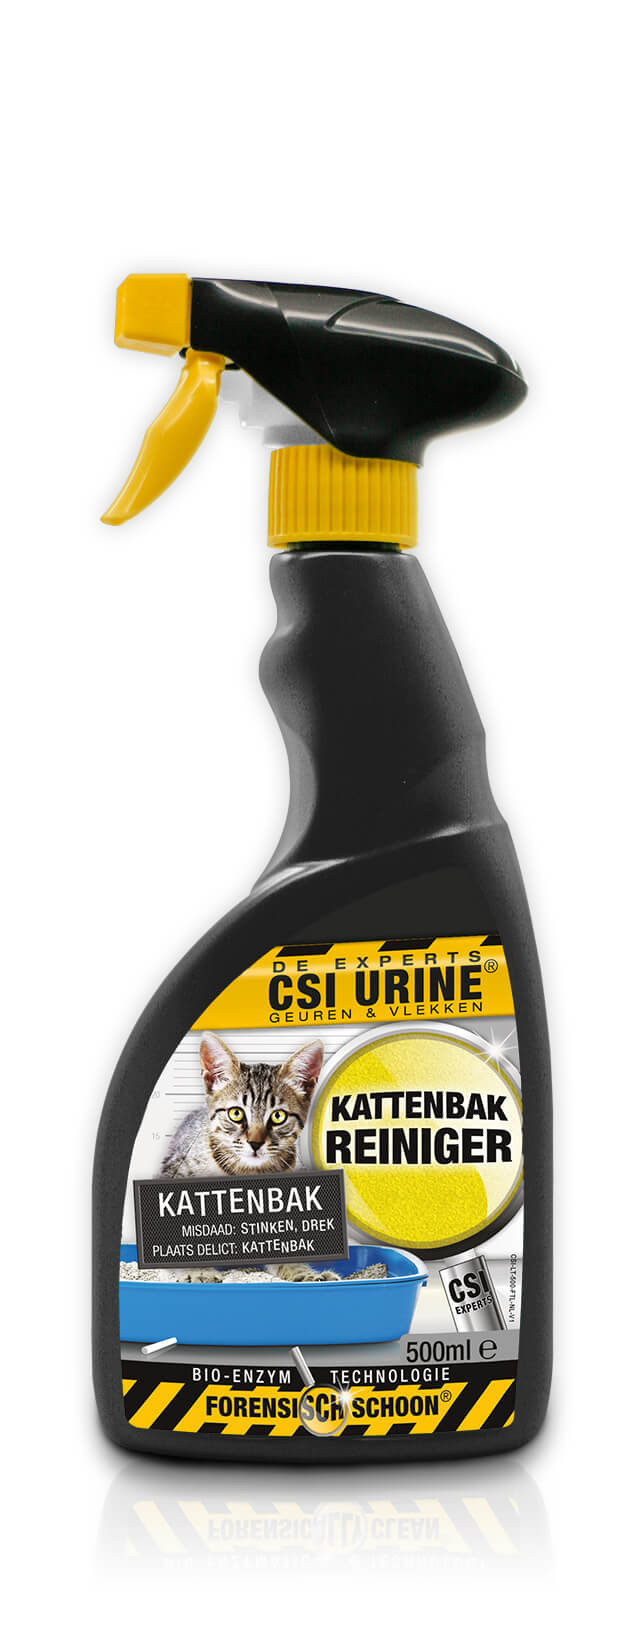 CSI Urine Kattenbakreiniger